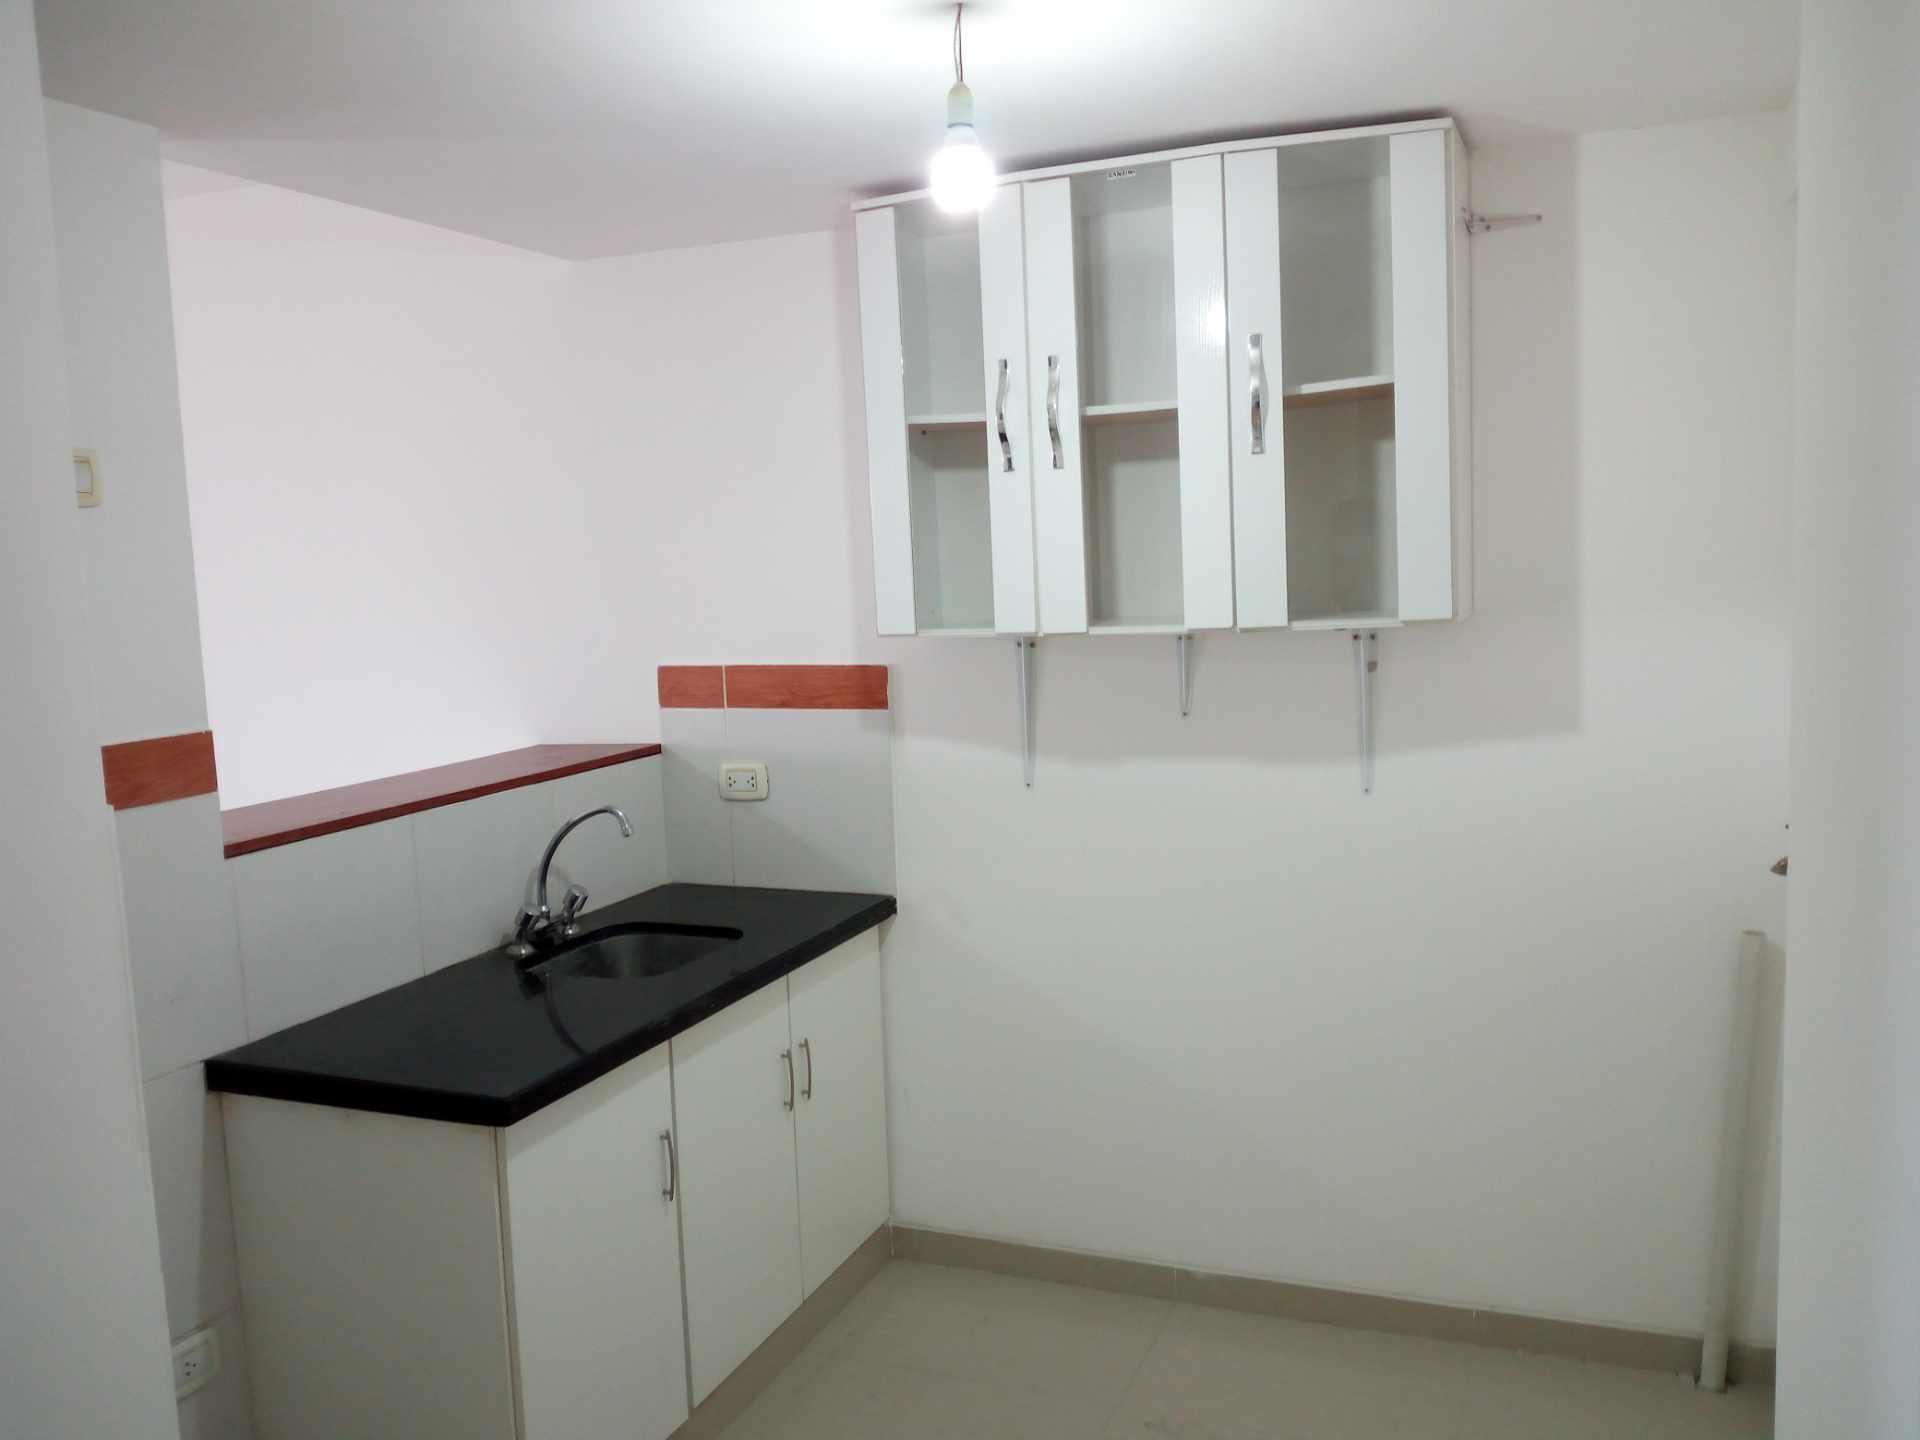 Departamento en Venta Entre 3er y 2do Anillo, Av. Guapay (Canal Cotoca) Foto 8